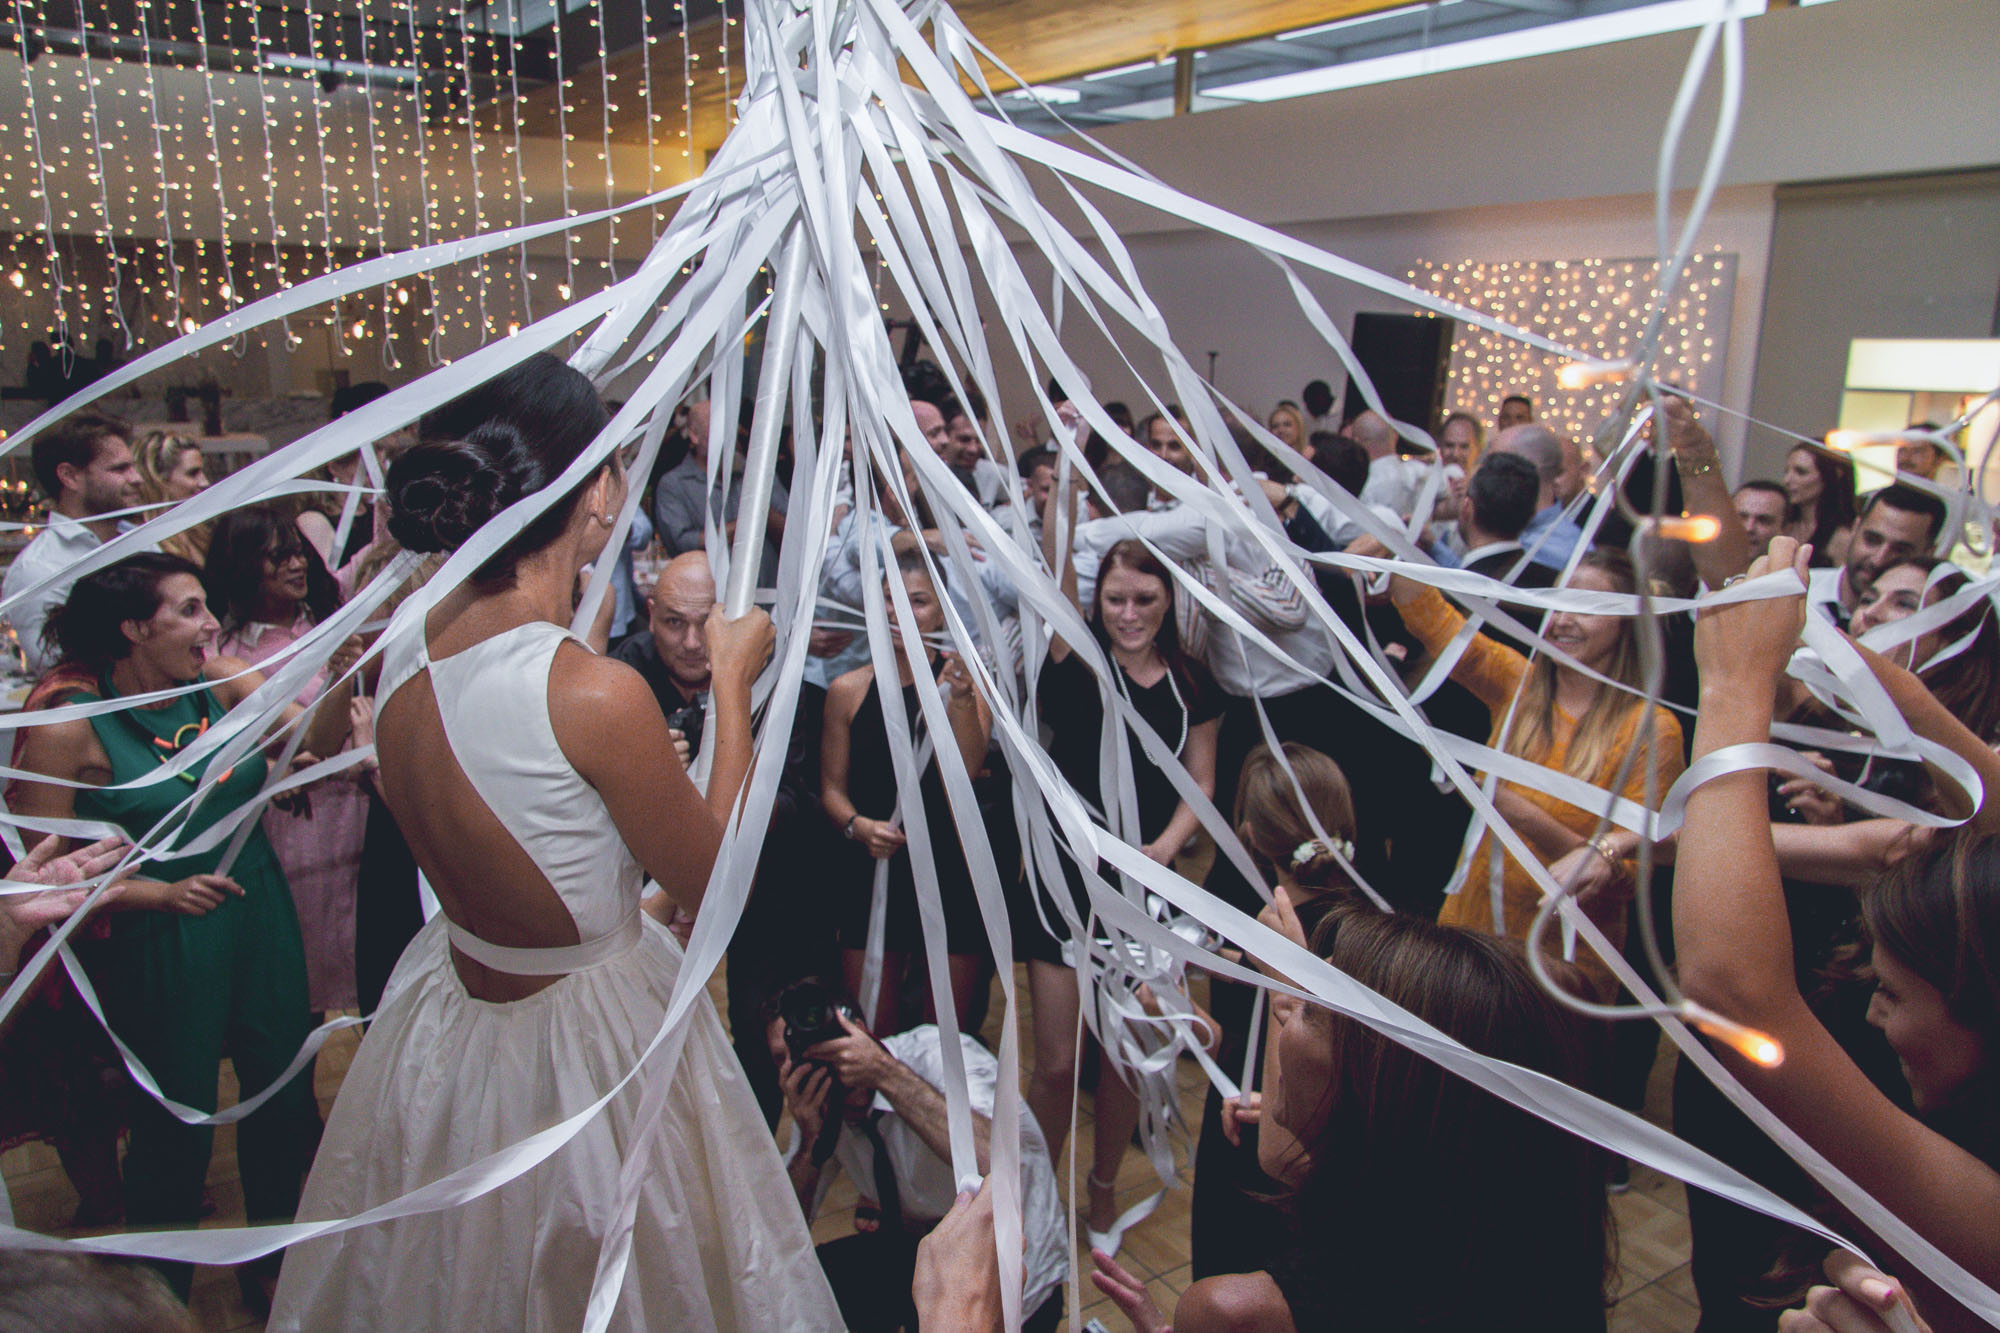 john-henry-wedding-photographer-kiara-ashley-001-33.jpg